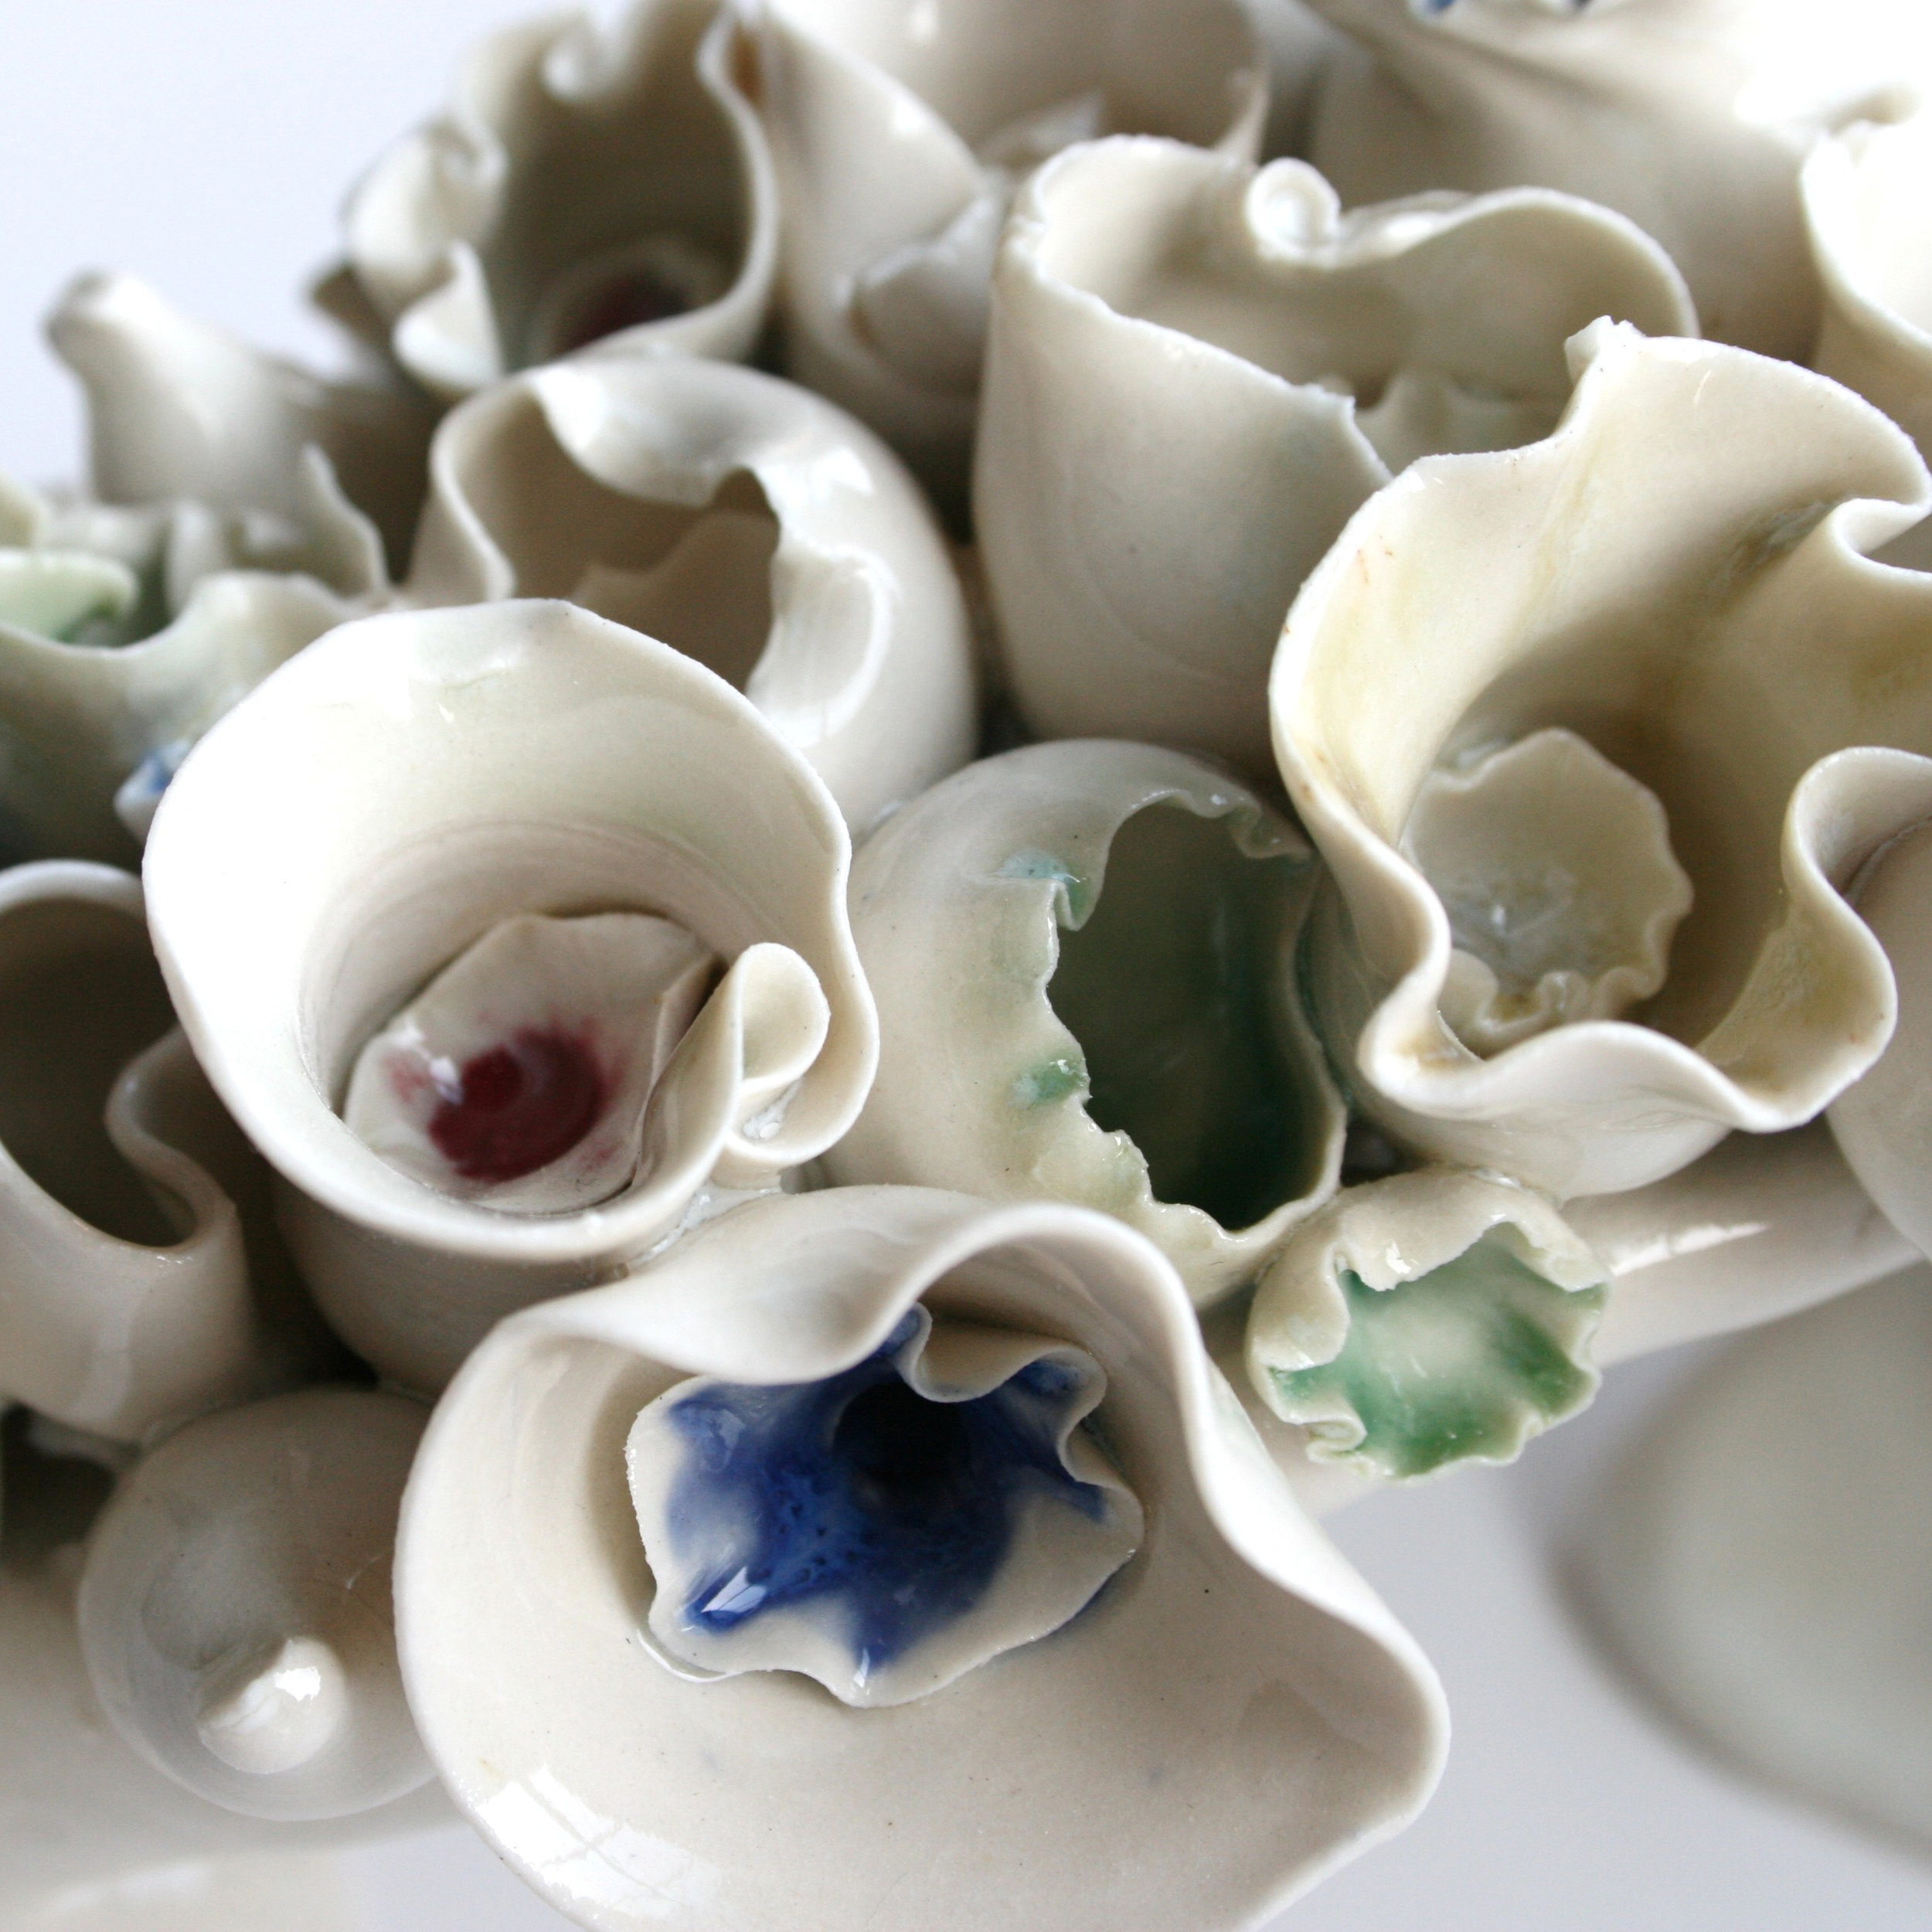 Seashells - Handle Detail 2 for store.JPG